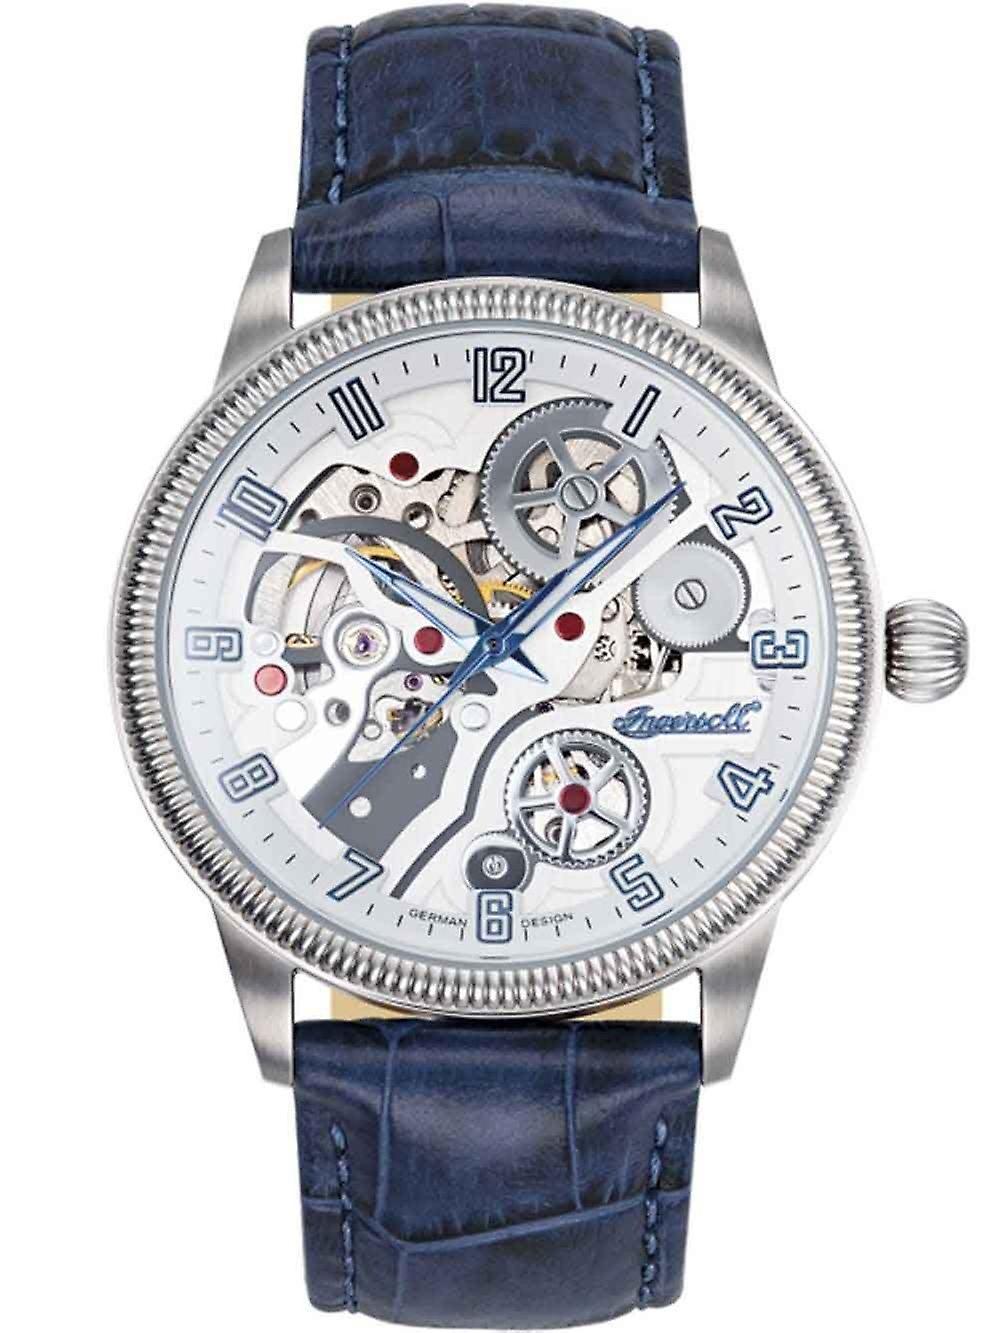 Ingersoll IN7220WH Becknalls Automatic men's Watch 42mm